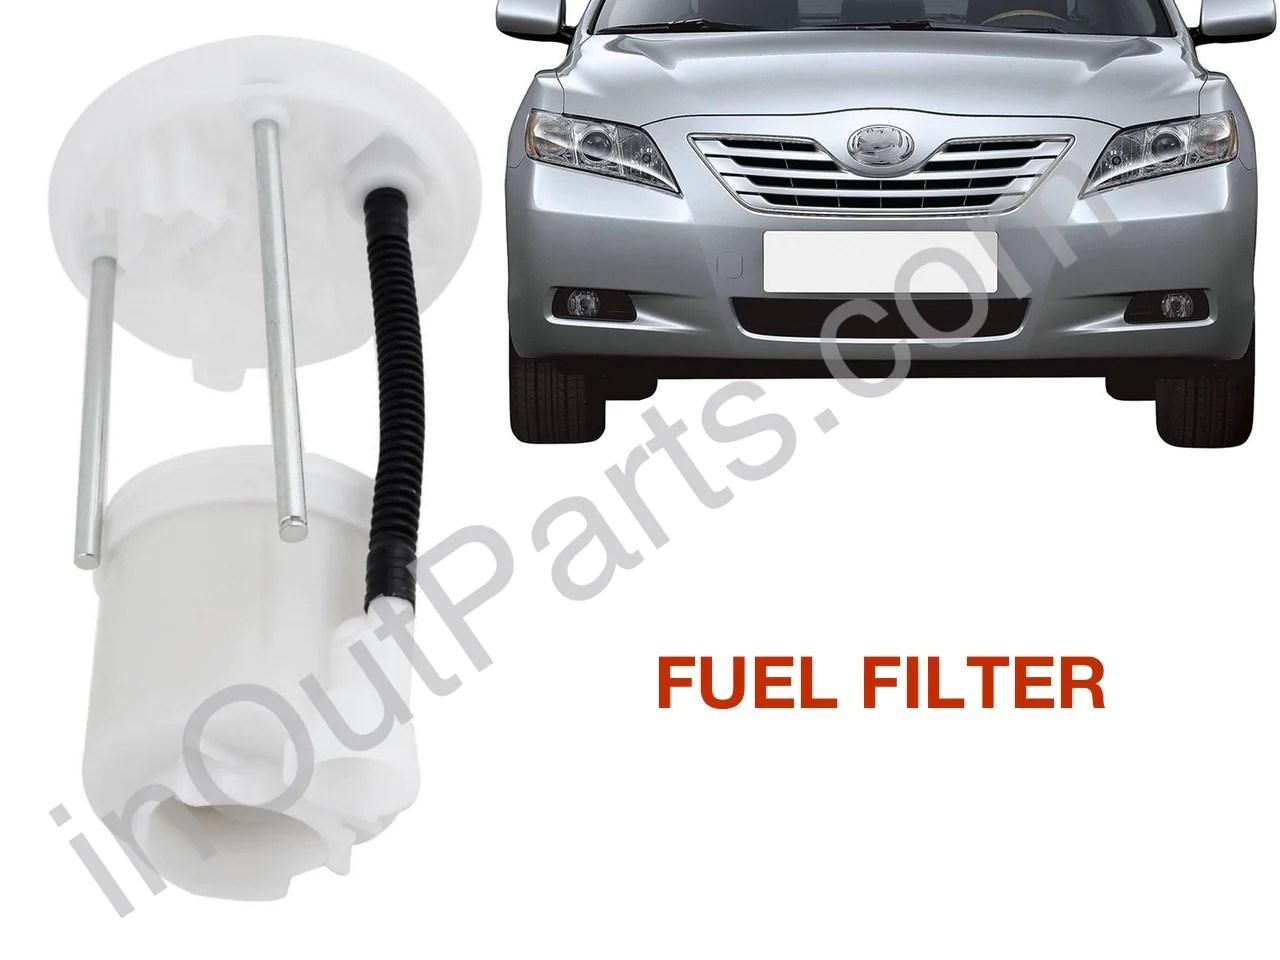 hight resolution of fuel filter toyota camry 2azfe 2006 2007 2008 2009 2010 2011 2012 1990 toyota pickup fuel